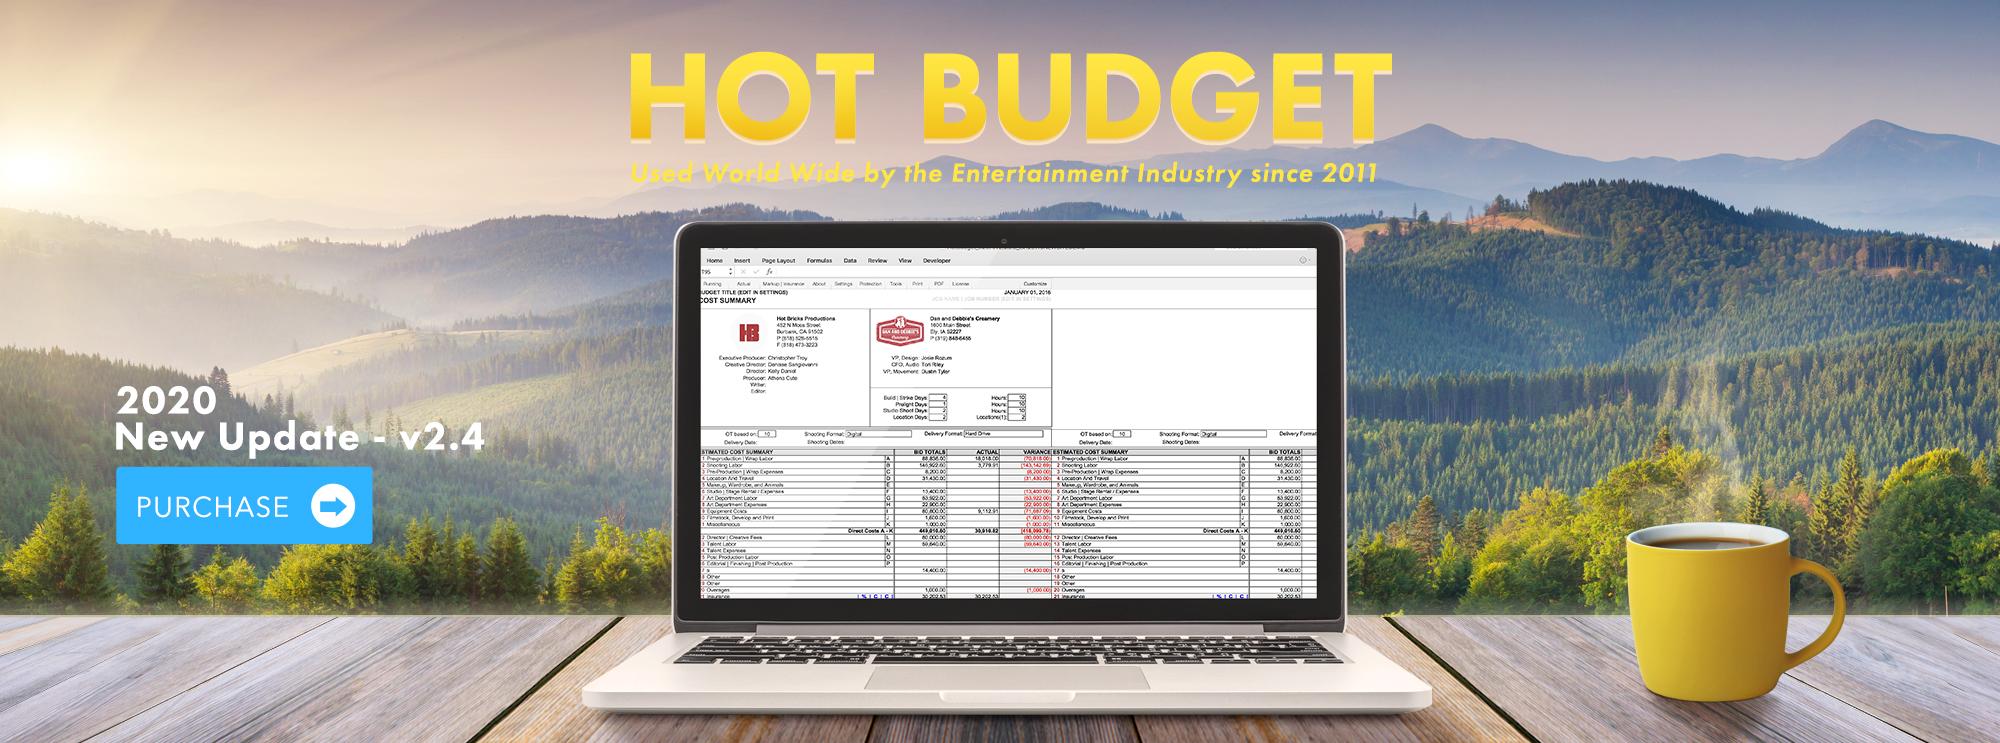 Hot Budget v2.4 2020